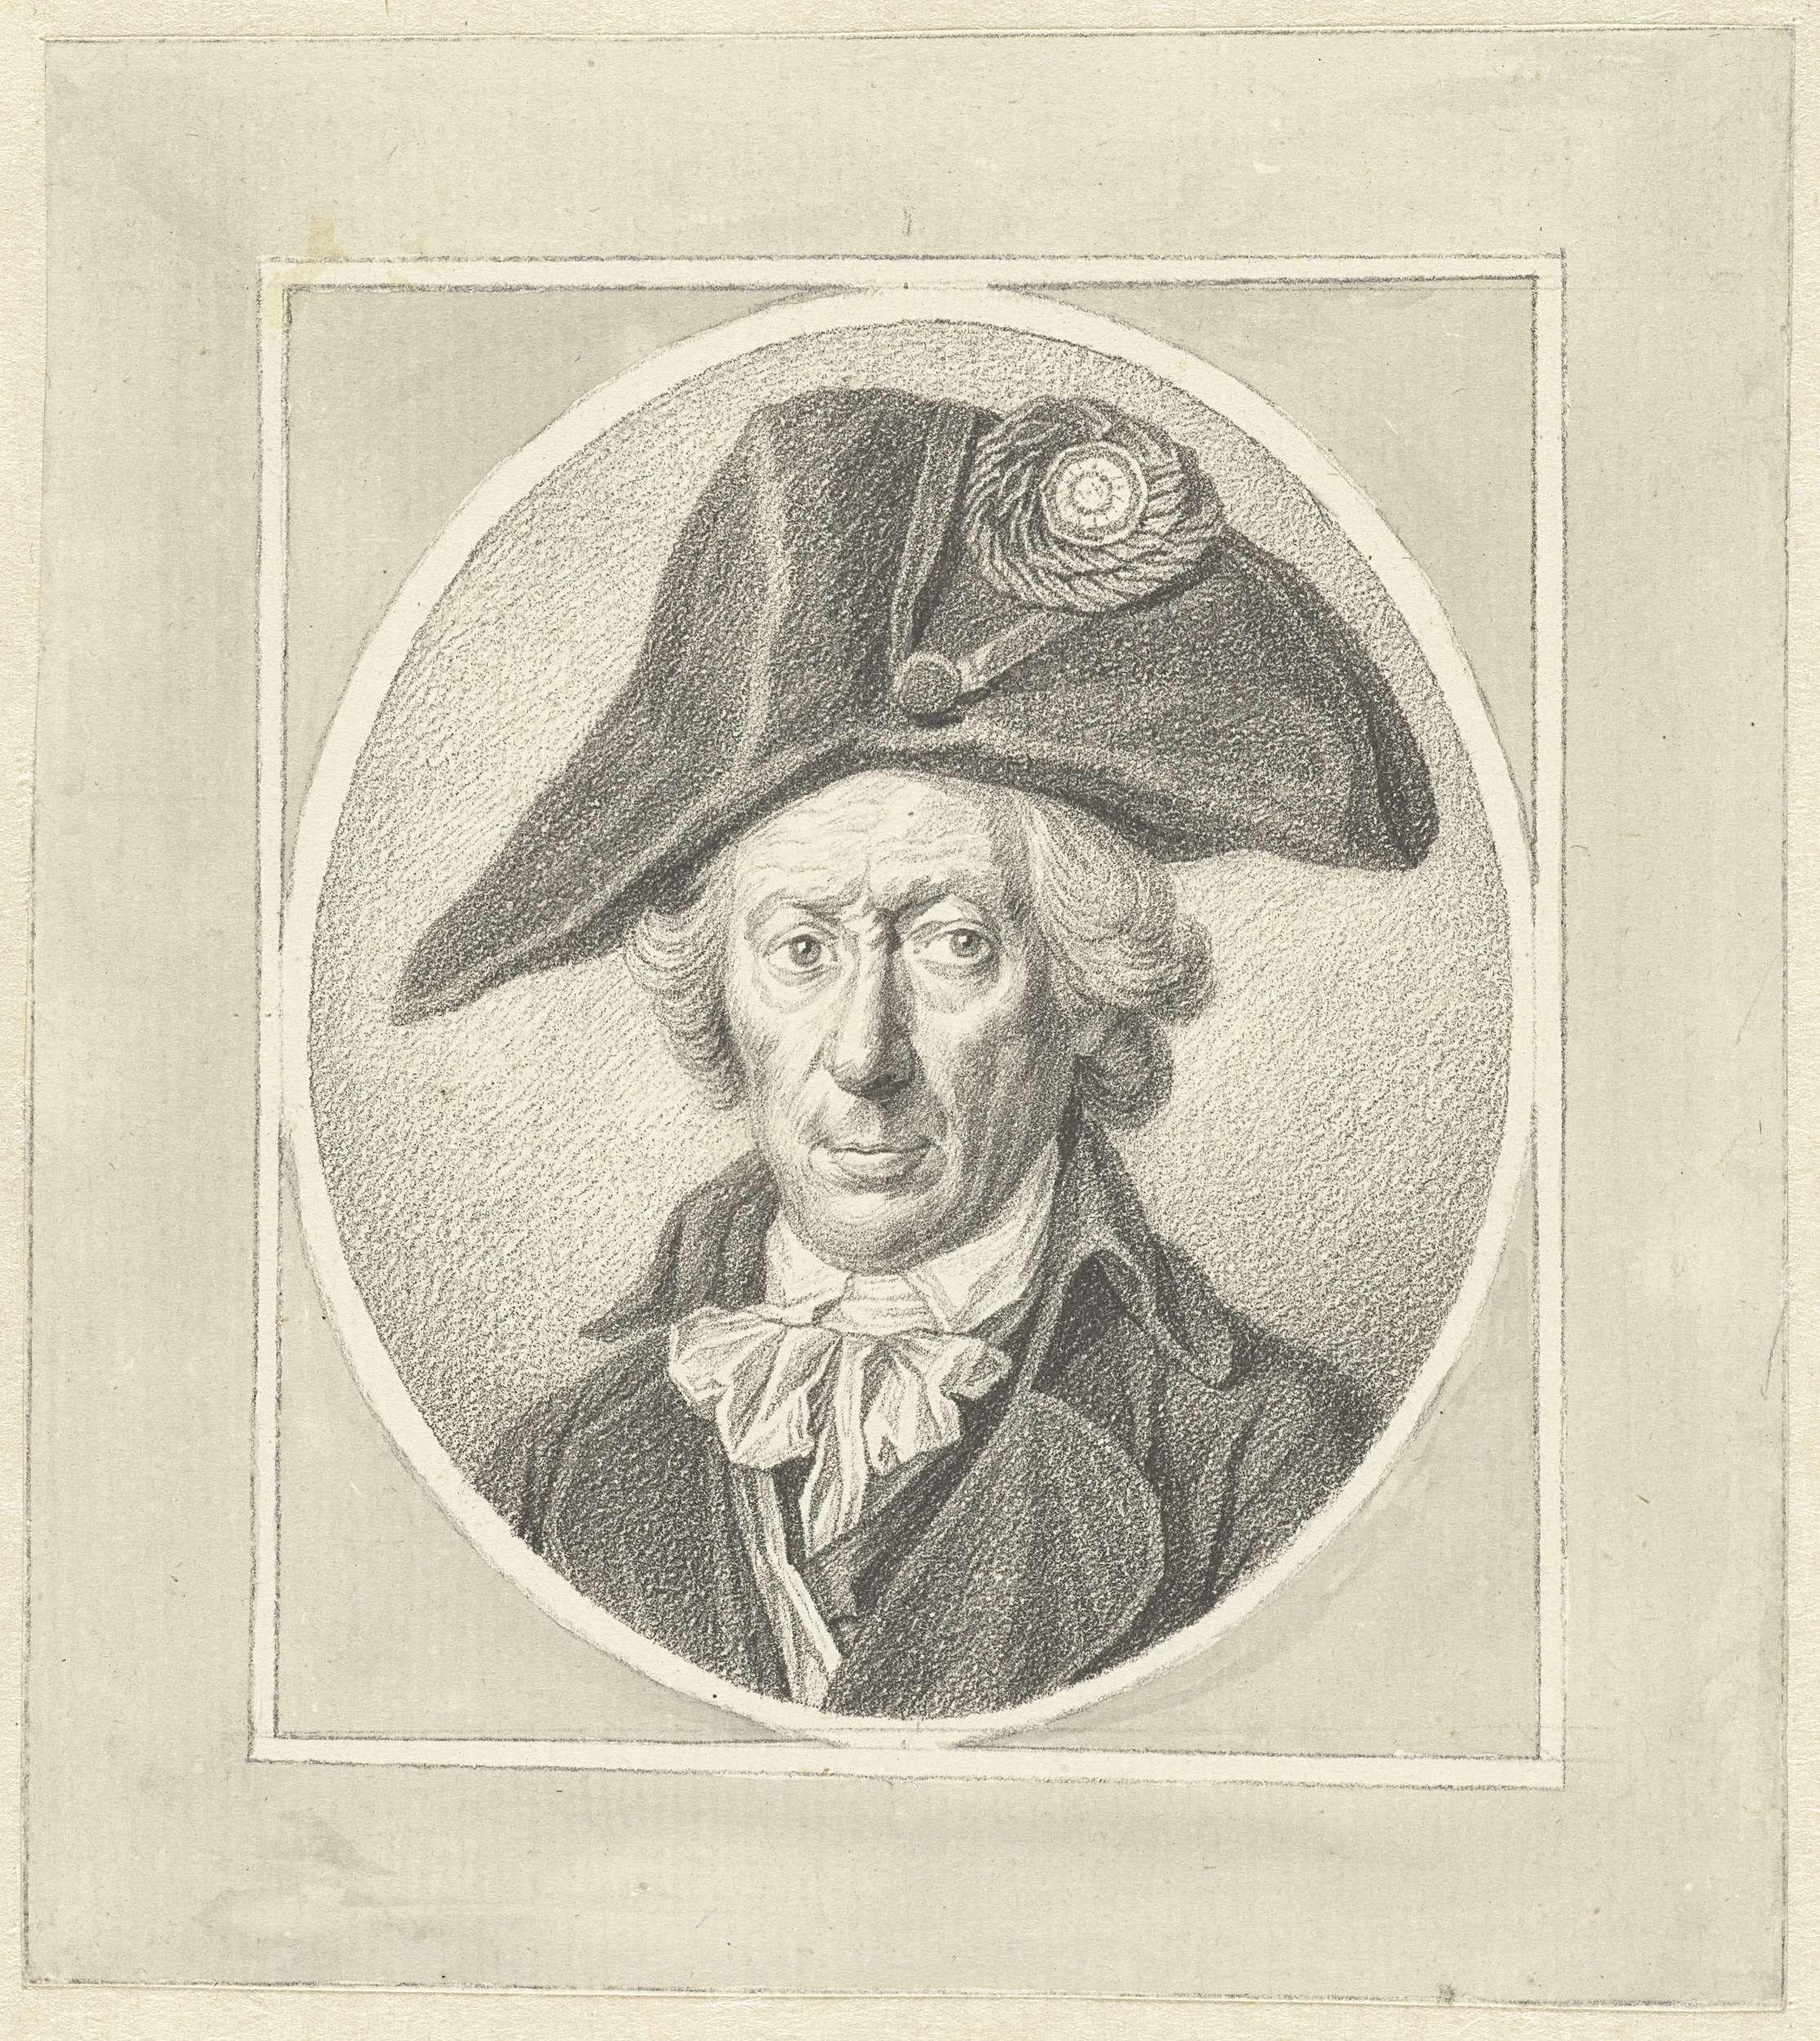 Johannes Cornelis Mertens | Portret van Hendrik Nobbe, waterbaljuw, Johannes Cornelis Mertens, 1752 - 1823 |